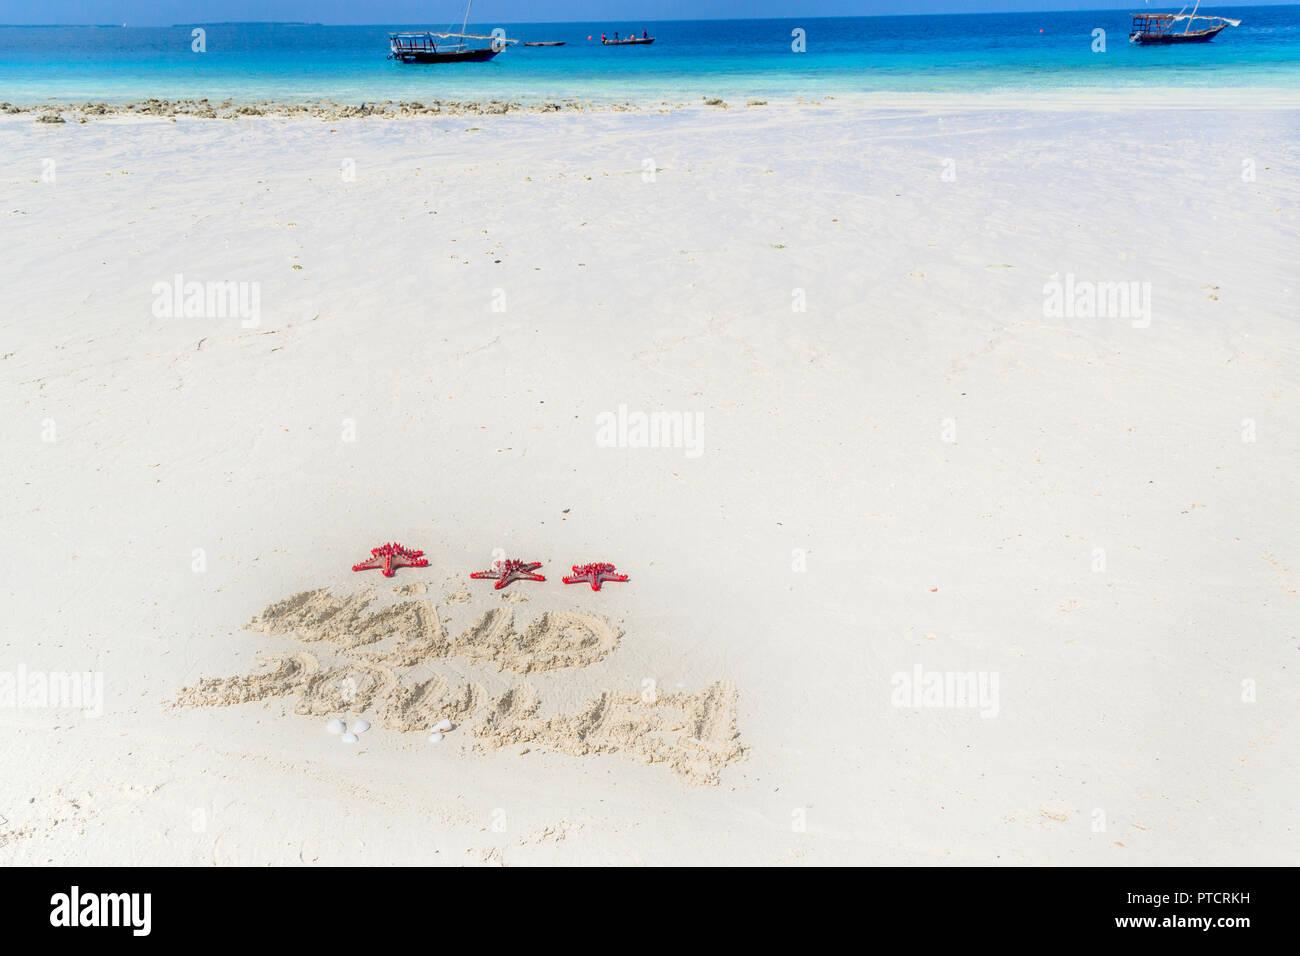 merry christmas written in Estonian on the sand, zanzibar , nungwi paradise beach, africa - Stock Image